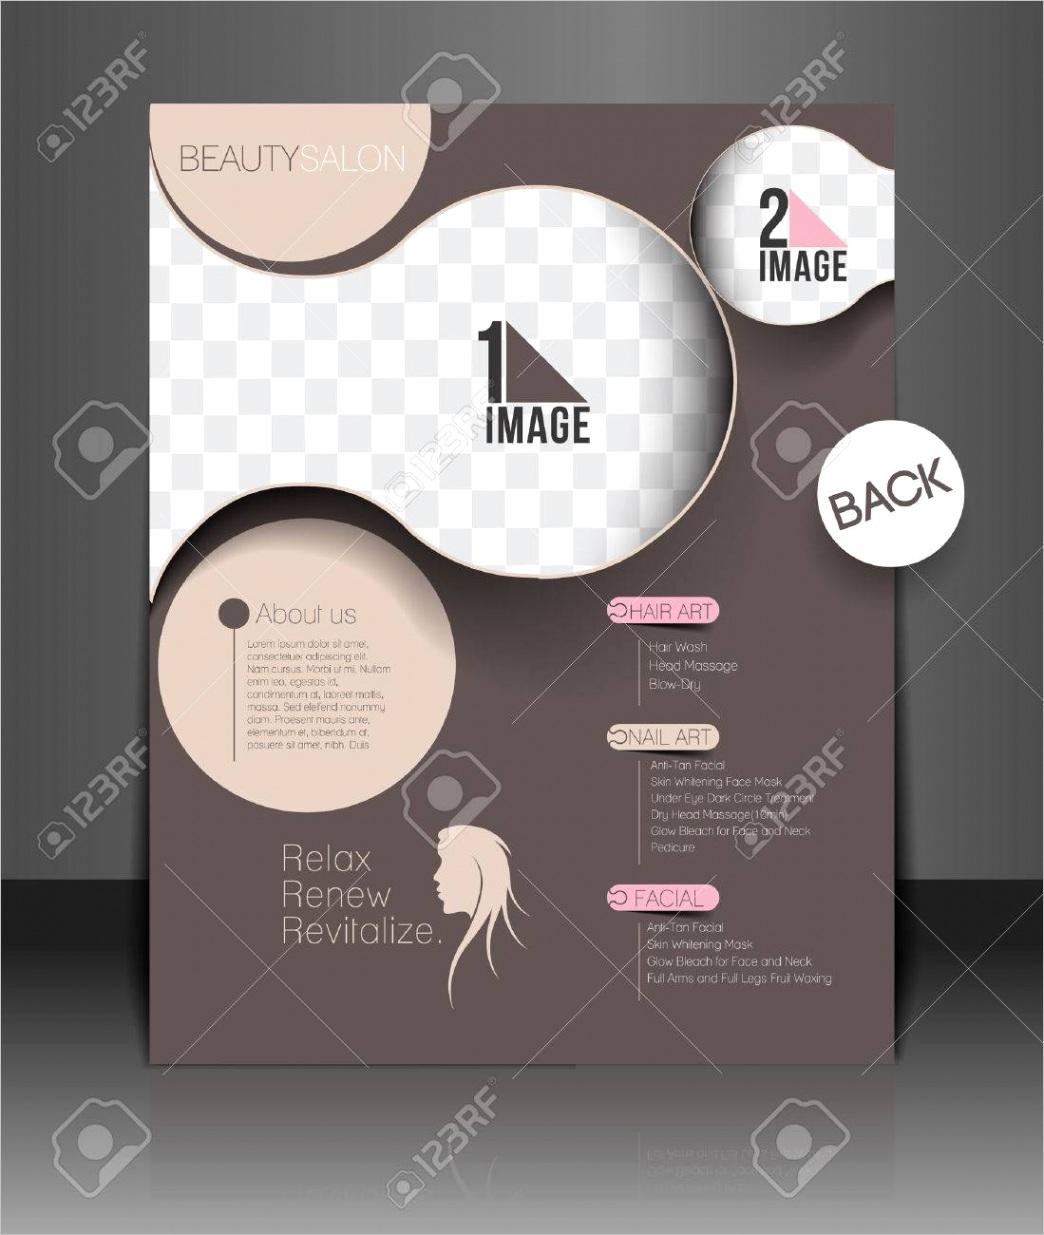 photo beauty care salon flyer poster template